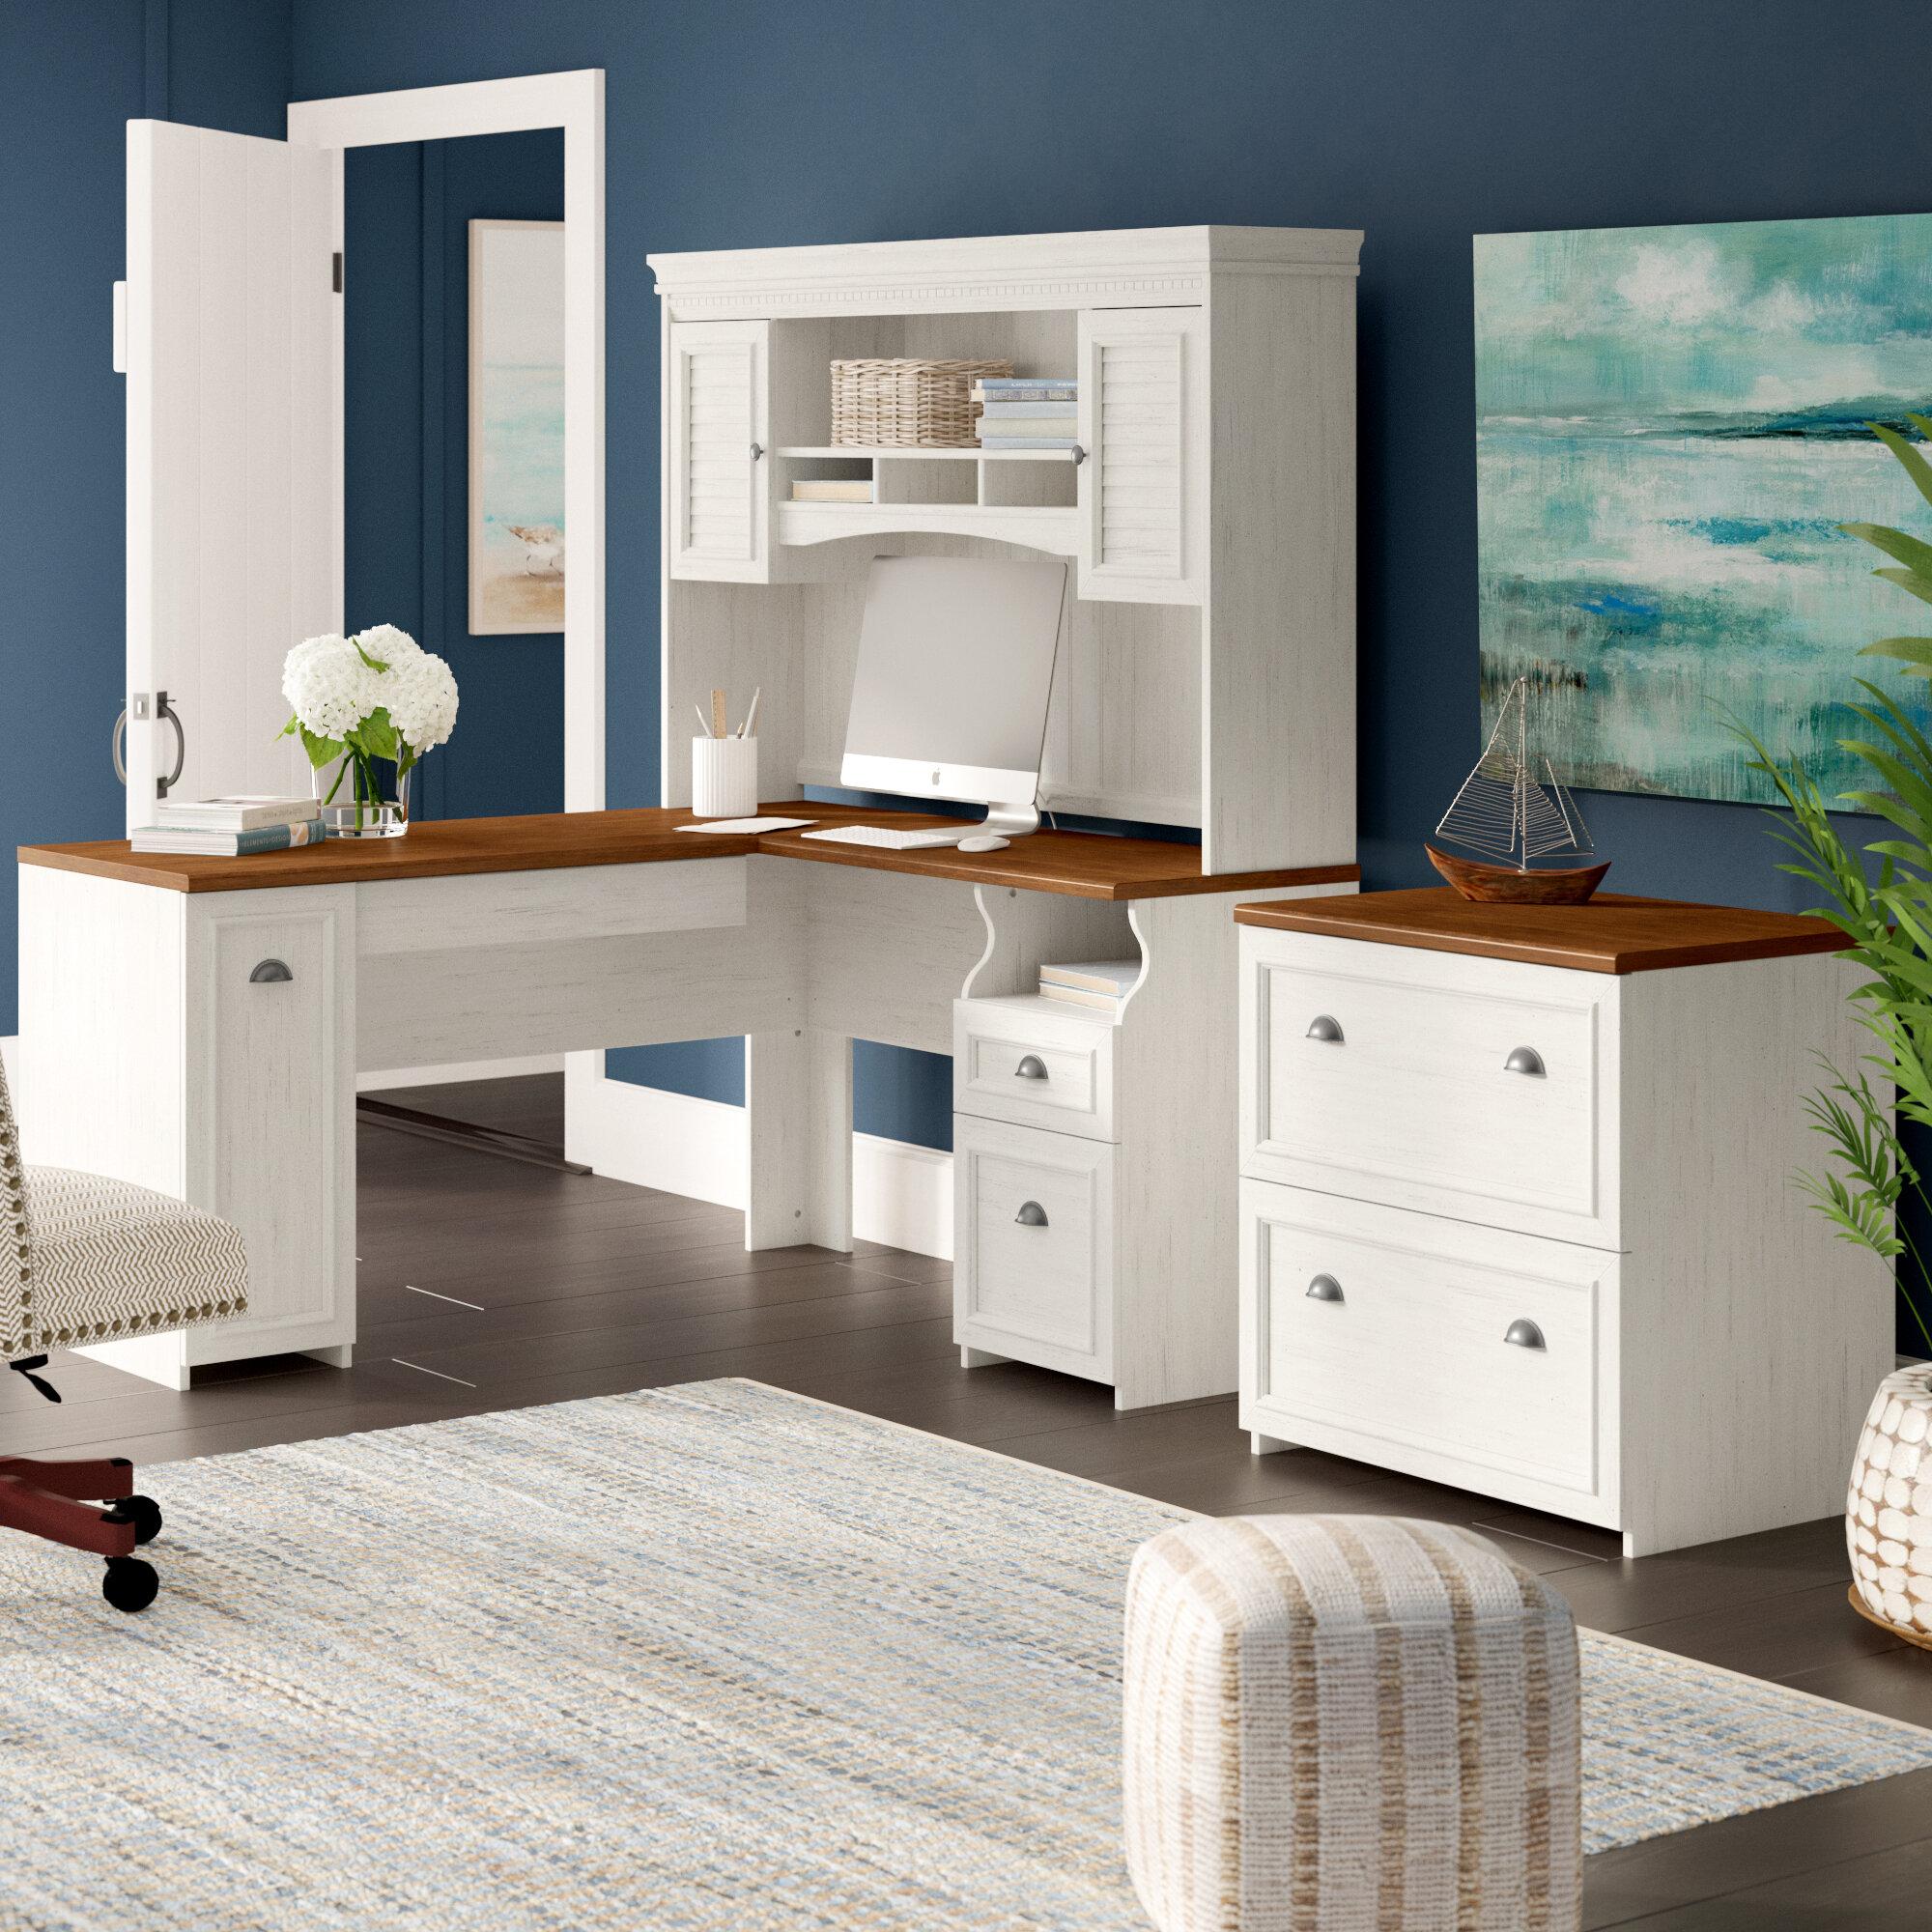 Enjoyable Oakridge 2 Piece Office Set With Hutch Home Interior And Landscaping Ponolsignezvosmurscom